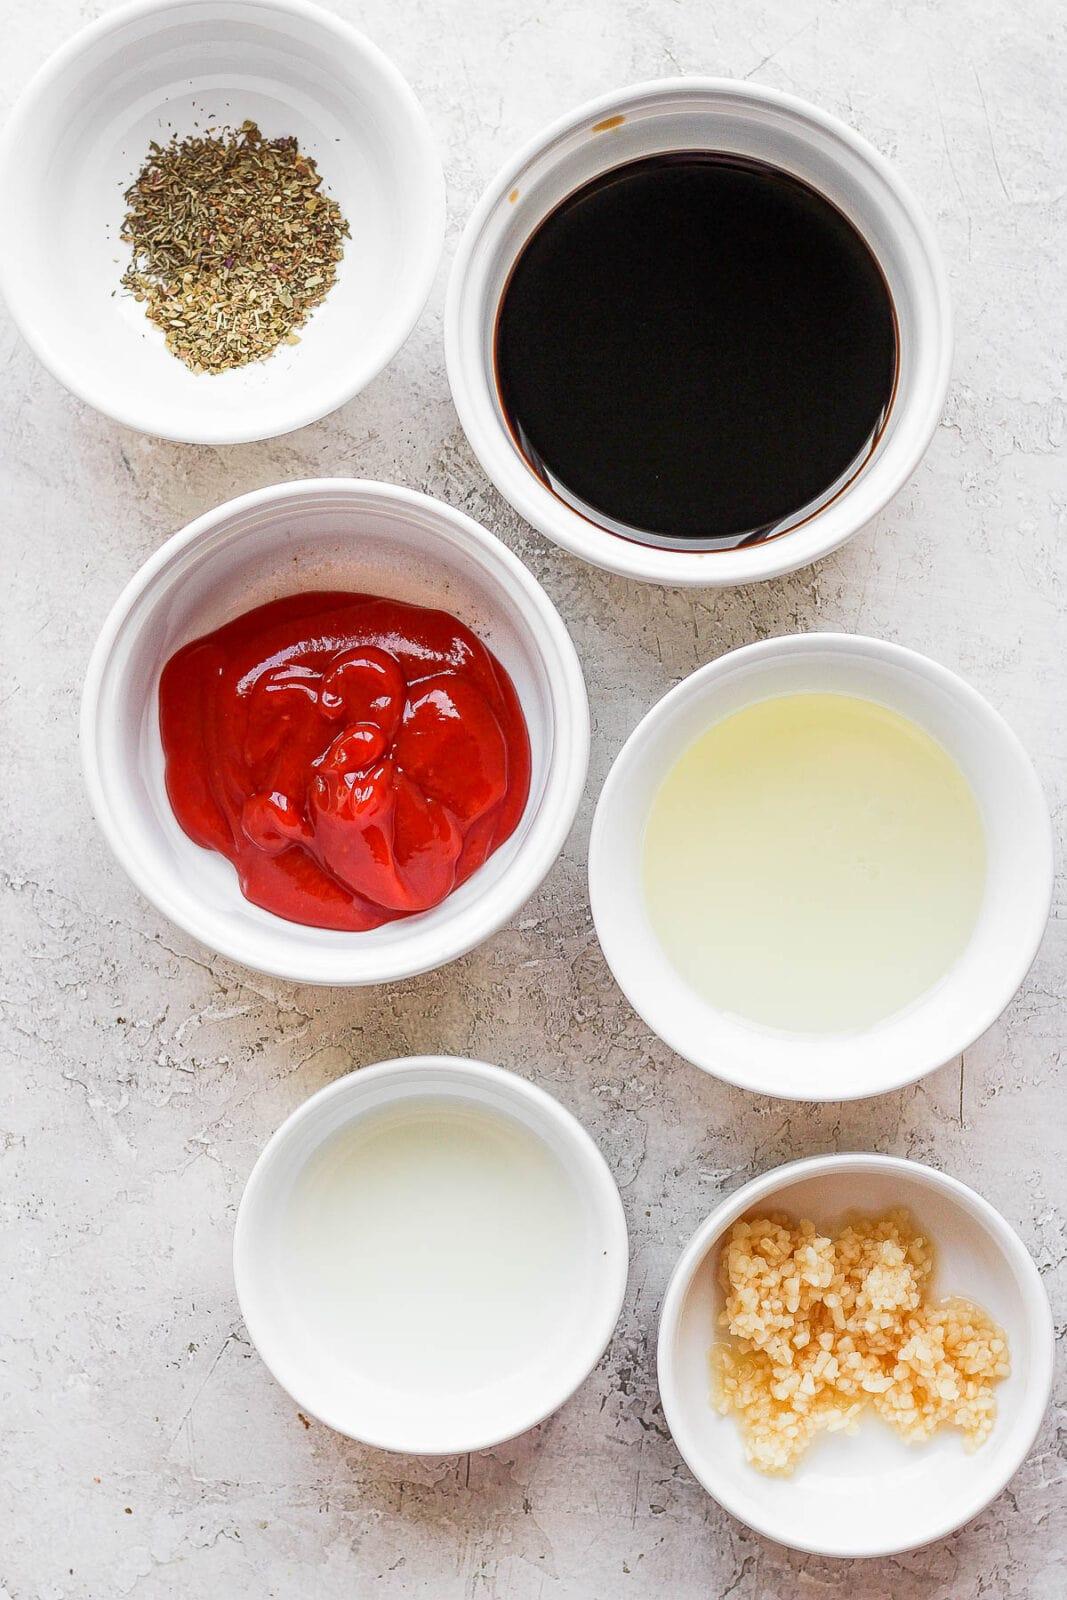 Ingredients for a pork tenderloin marinade in separate bowls.